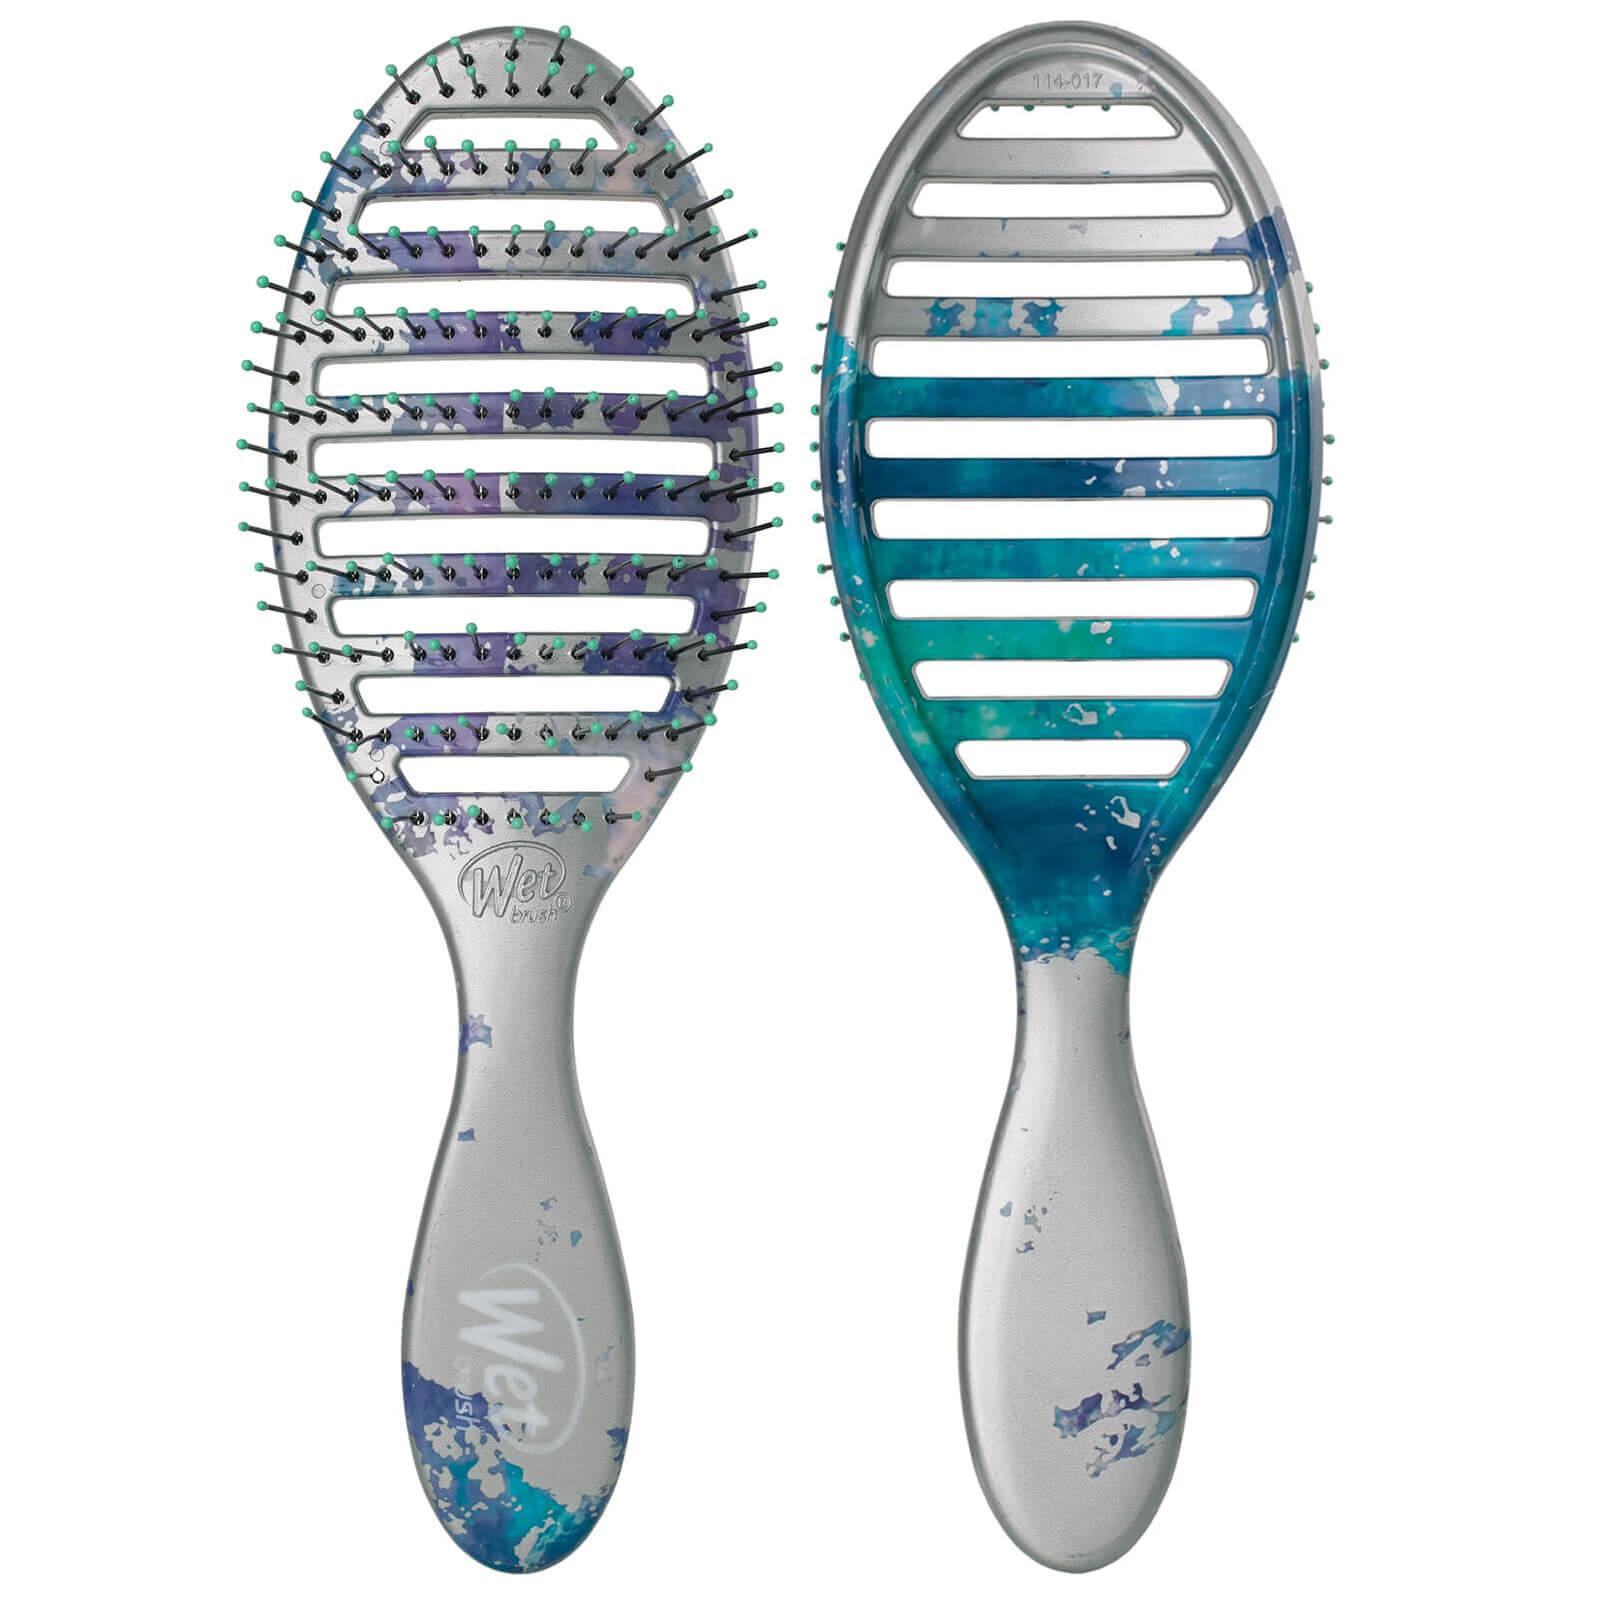 Купить WetBrush Stellar Skies Speed Dry Brush - Turquoise Skies